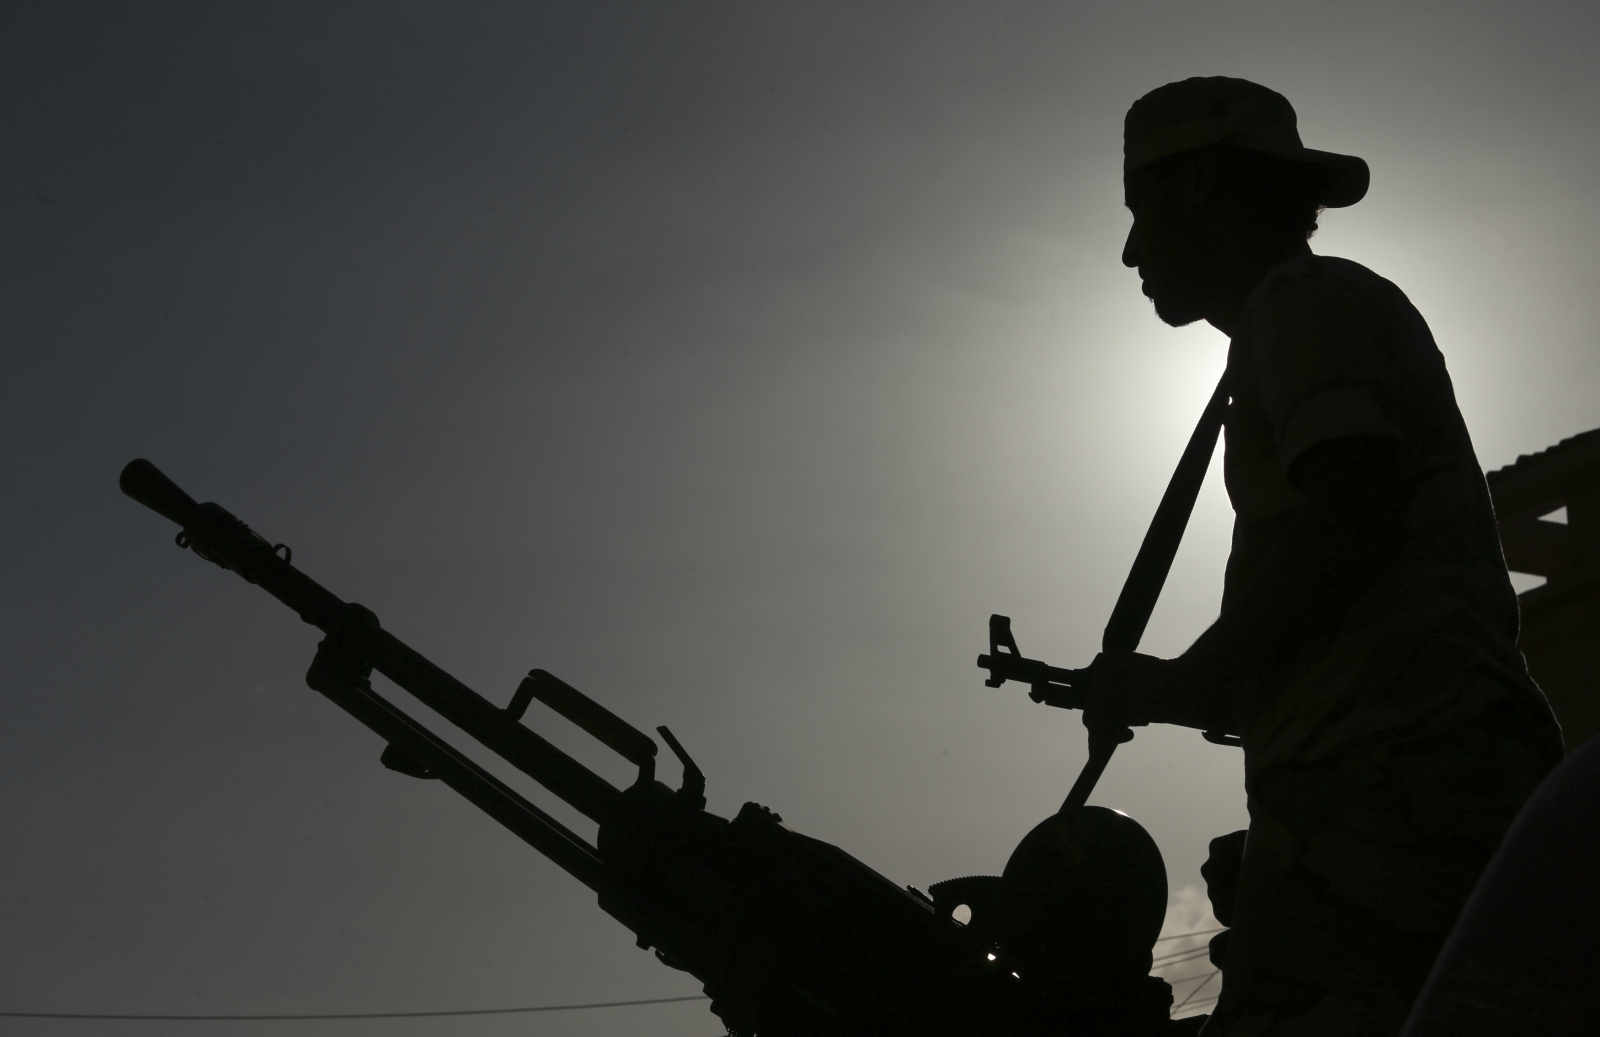 Arab League to hold emergency talks on Libyan unrest